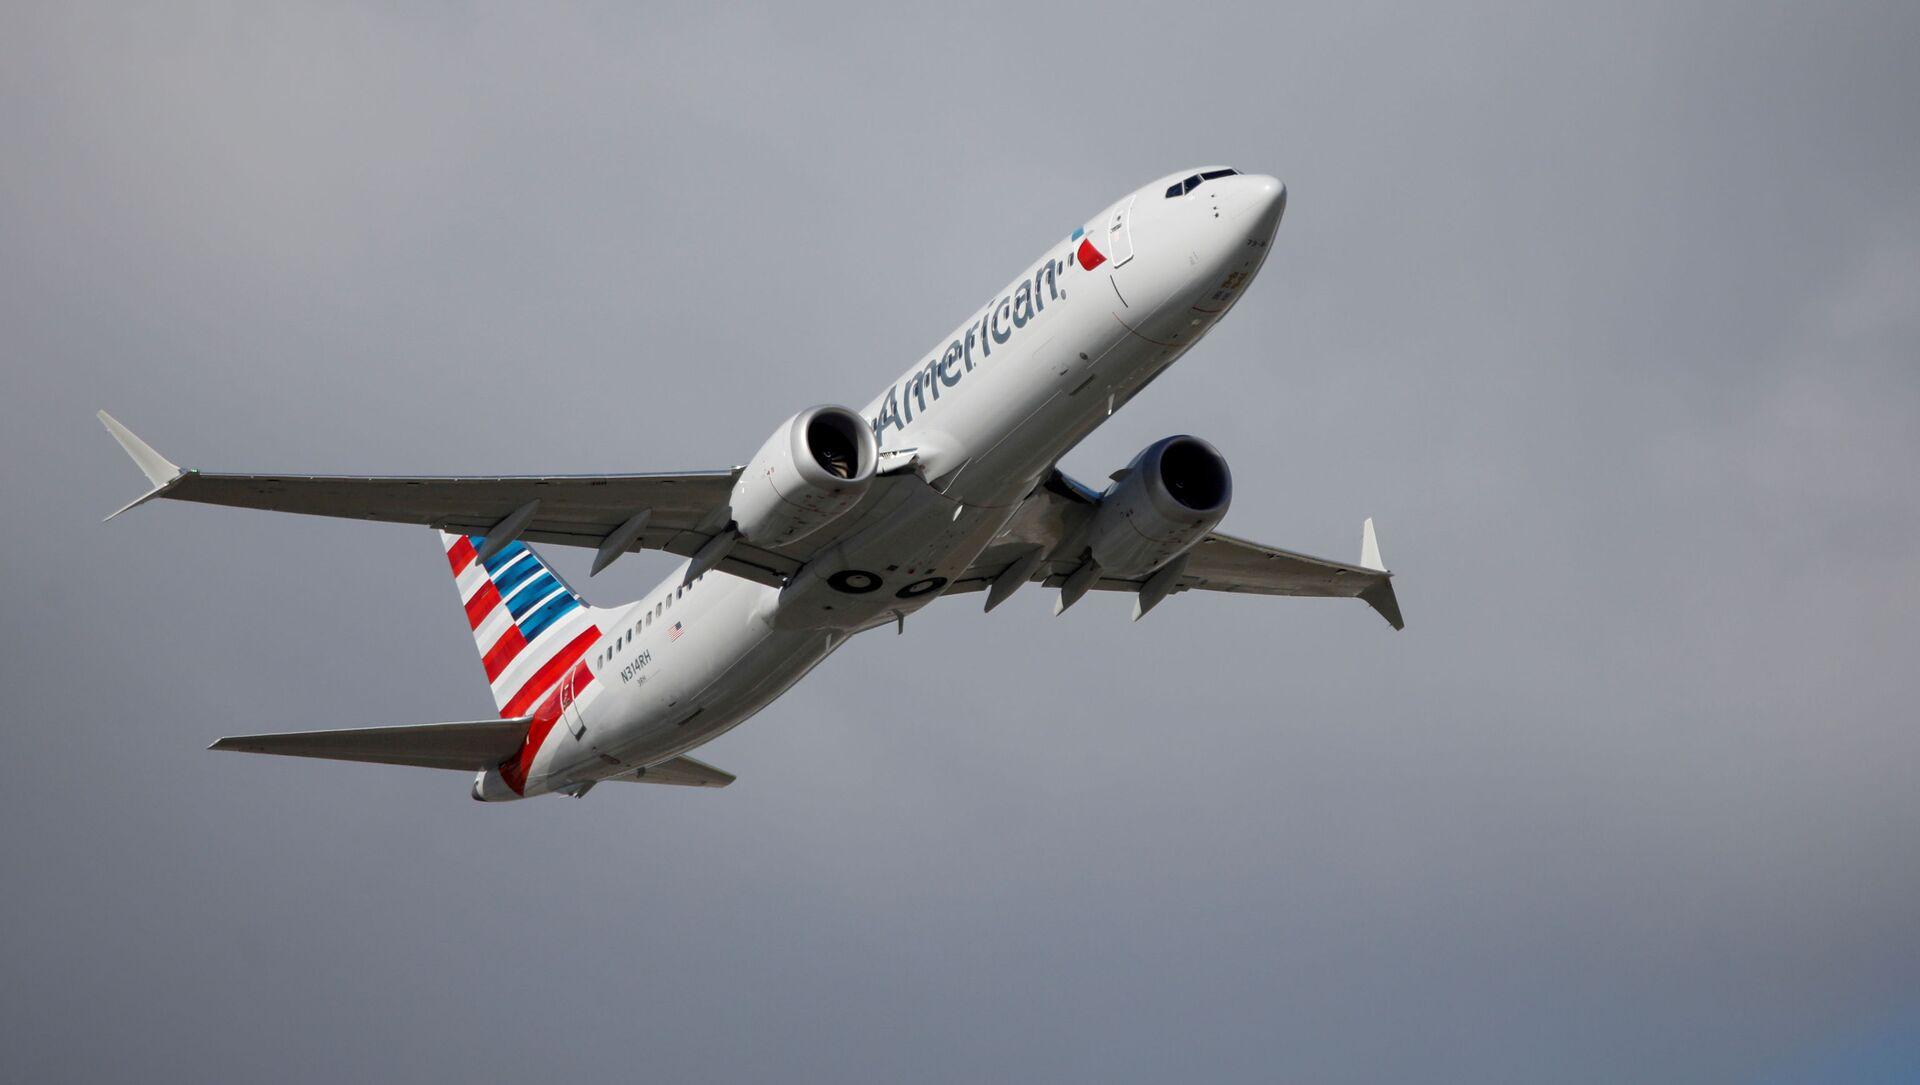 Samolot Boeing 737 MAX linii lotniczych American Airlines. - Sputnik Polska, 1920, 09.04.2021